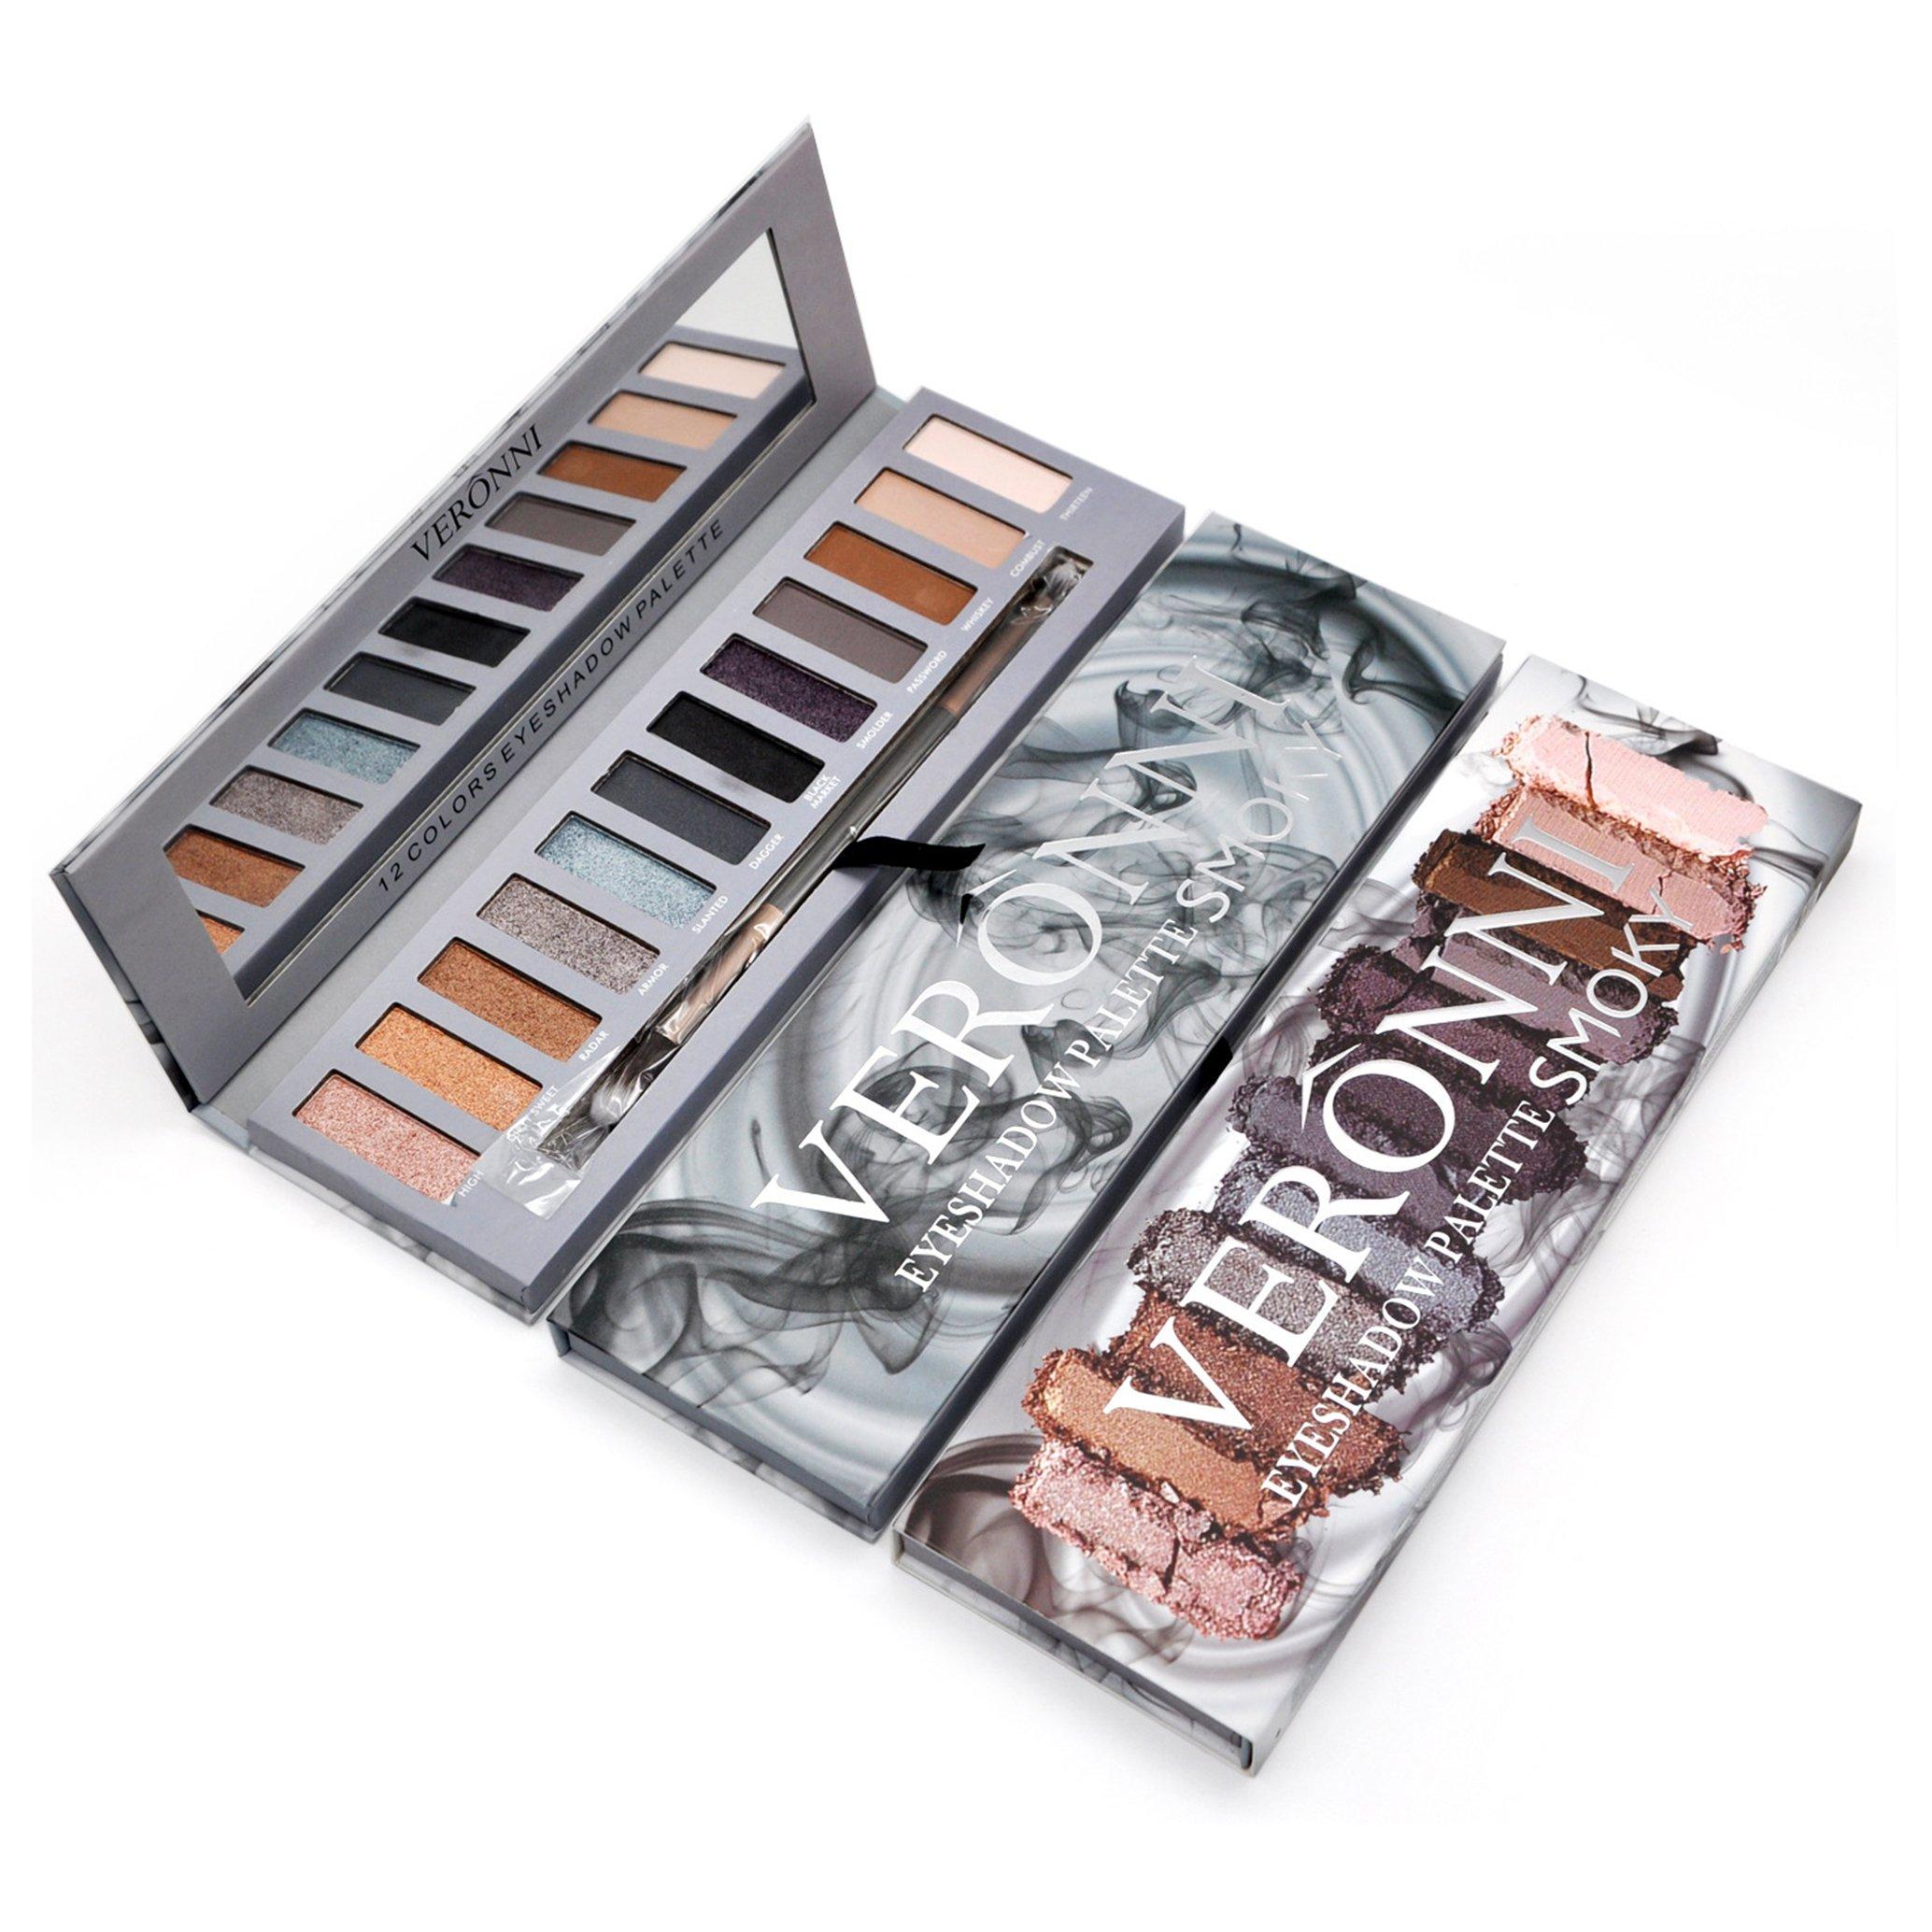 Eyeshadow Palette Smoky Makeup kit,Matte&Shimmer 12Colors   High Pigmented   Vegan Nude Warm Natural Smokey Pro Eye Shadow with Mirror&Eye Brush Cosmetic Set